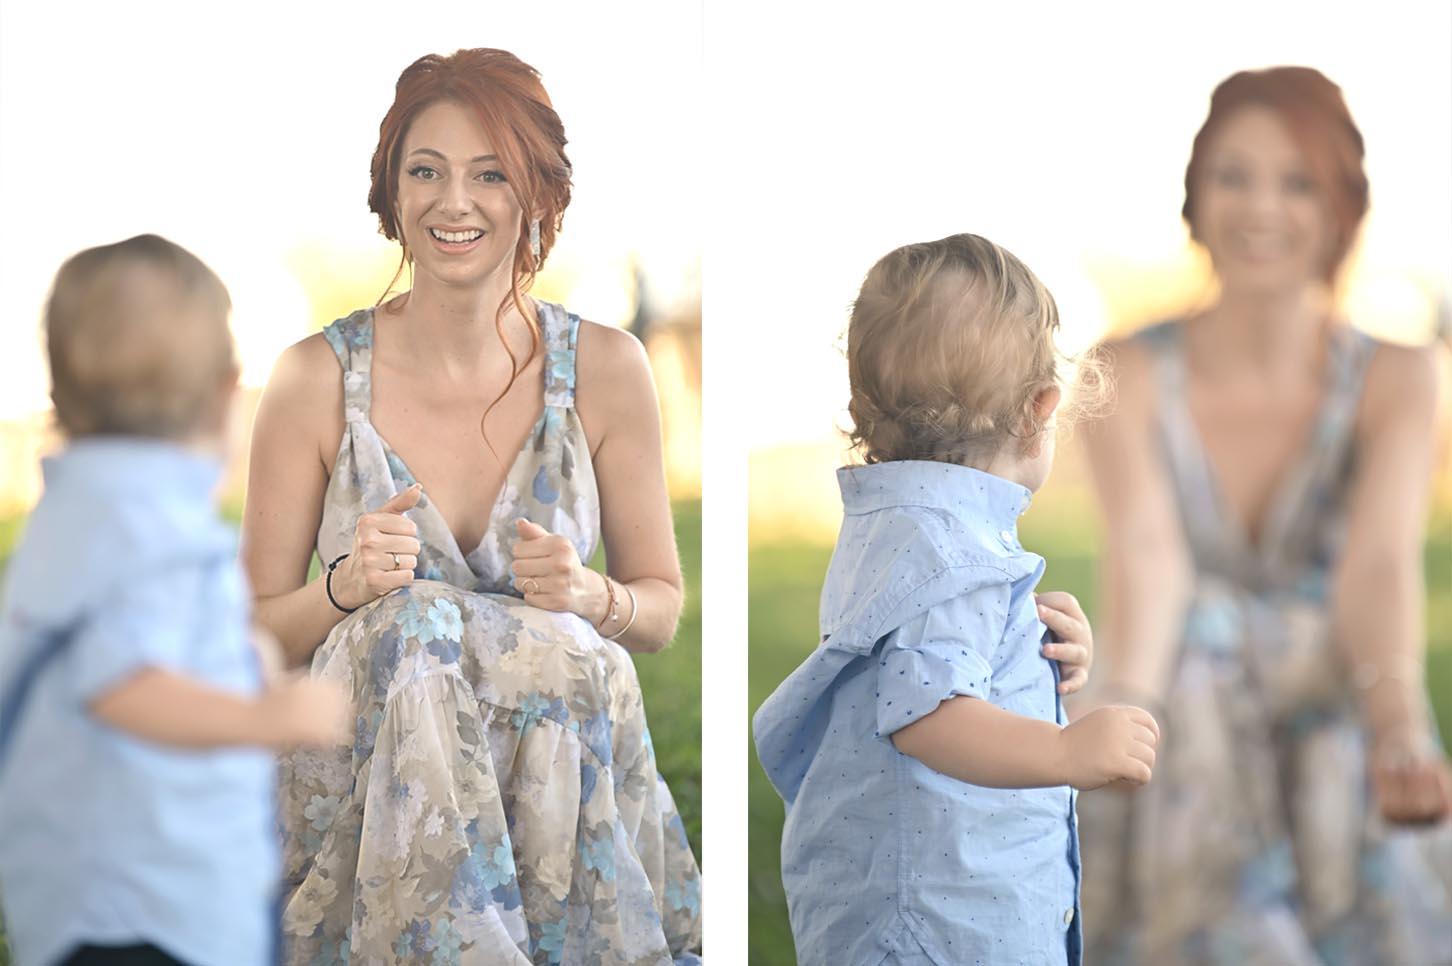 mum-son -family-portraits -l arissa-alexis-koumaditis-photography-01